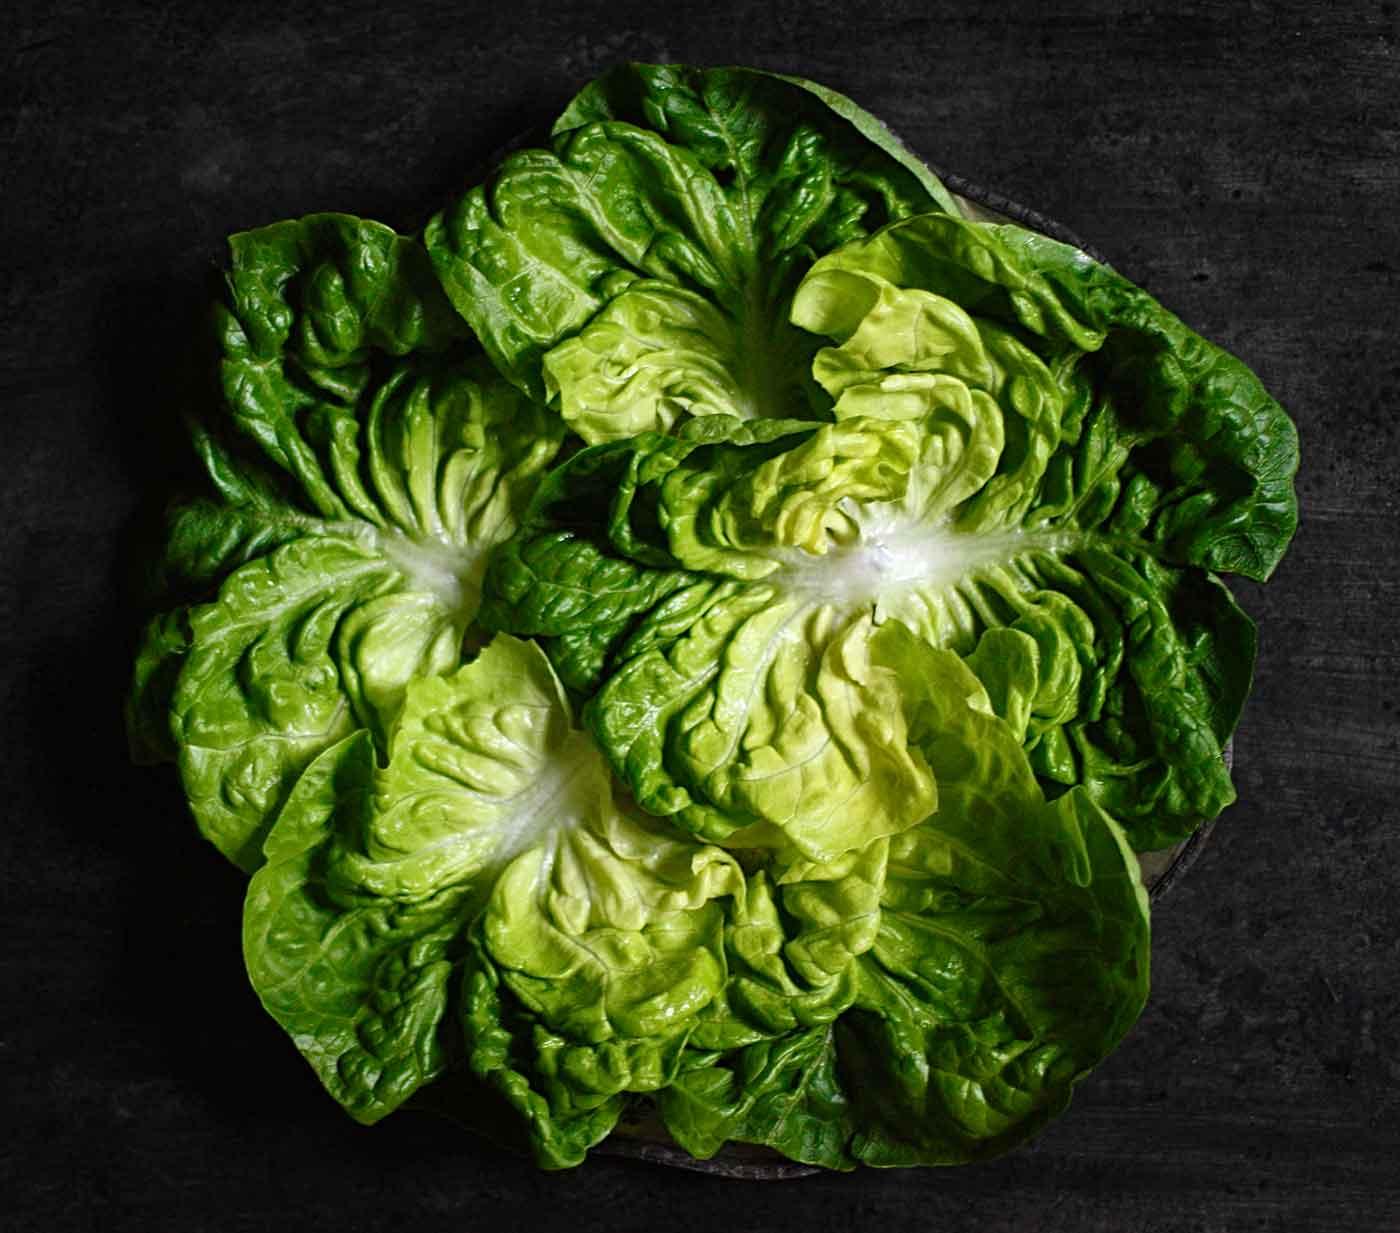 Leaves of Boston lettuce arranged in a ring